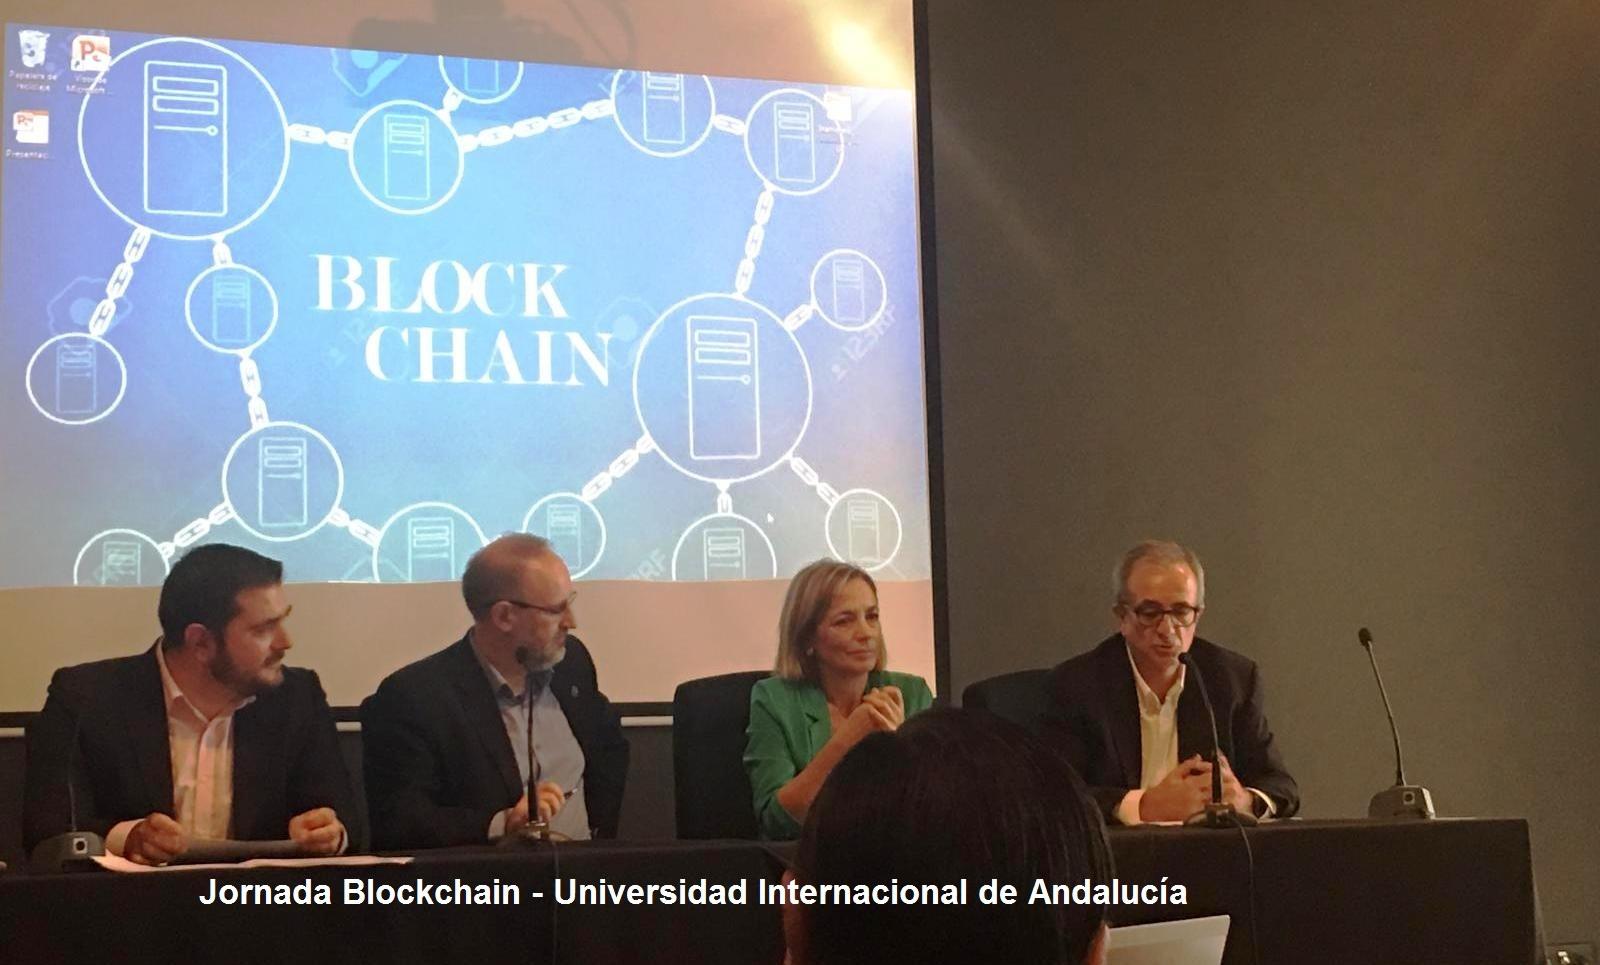 Jornada Blockchain - Universidad Internacional de Andalucia